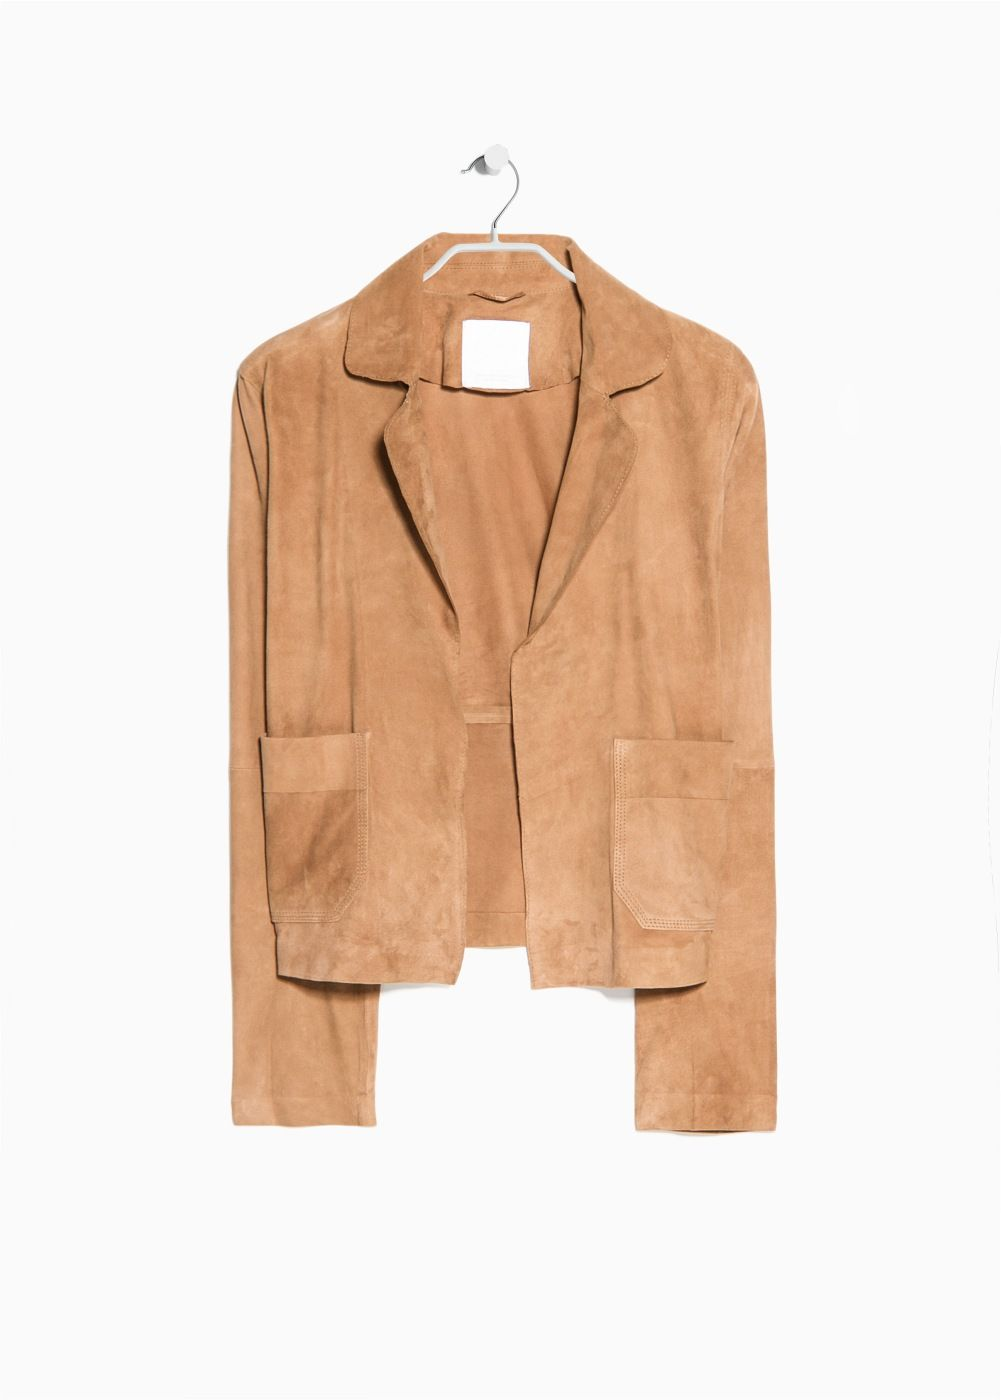 PREMIUM - Pocket leather jacket